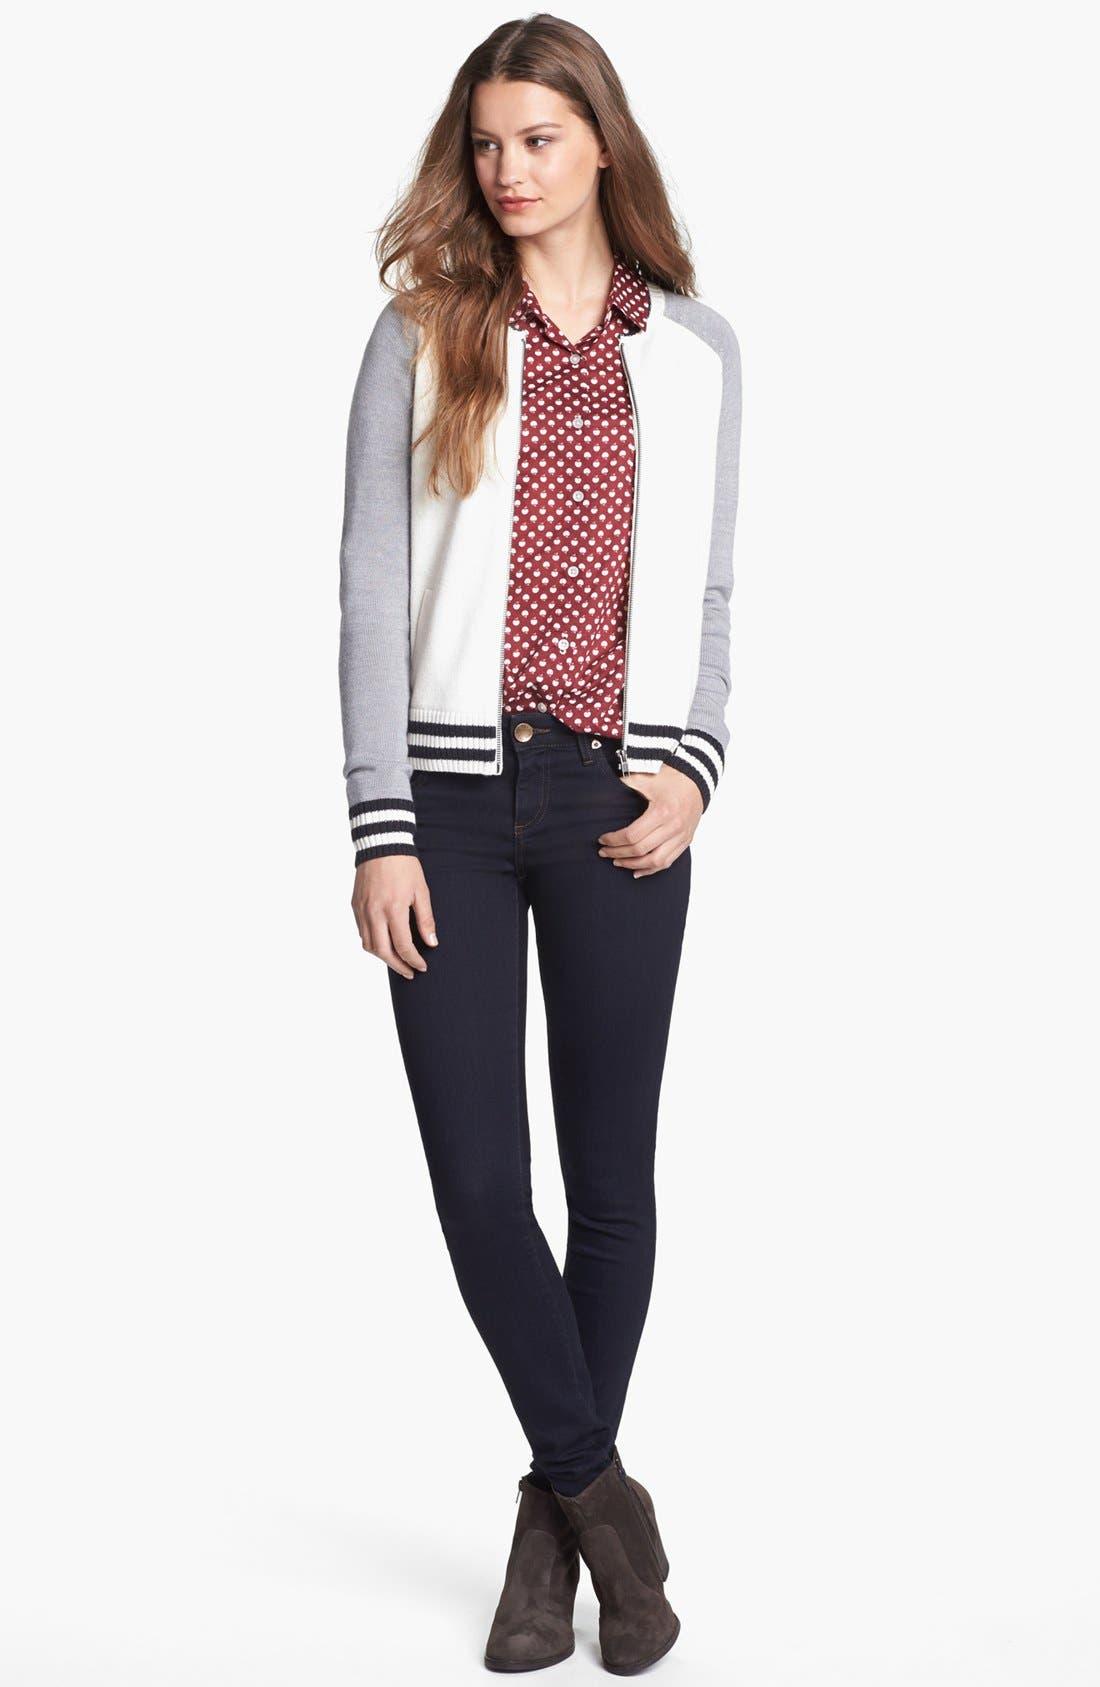 Main Image - Halogen® Cardigan, Shirt & KUT from the Kloth Jeans